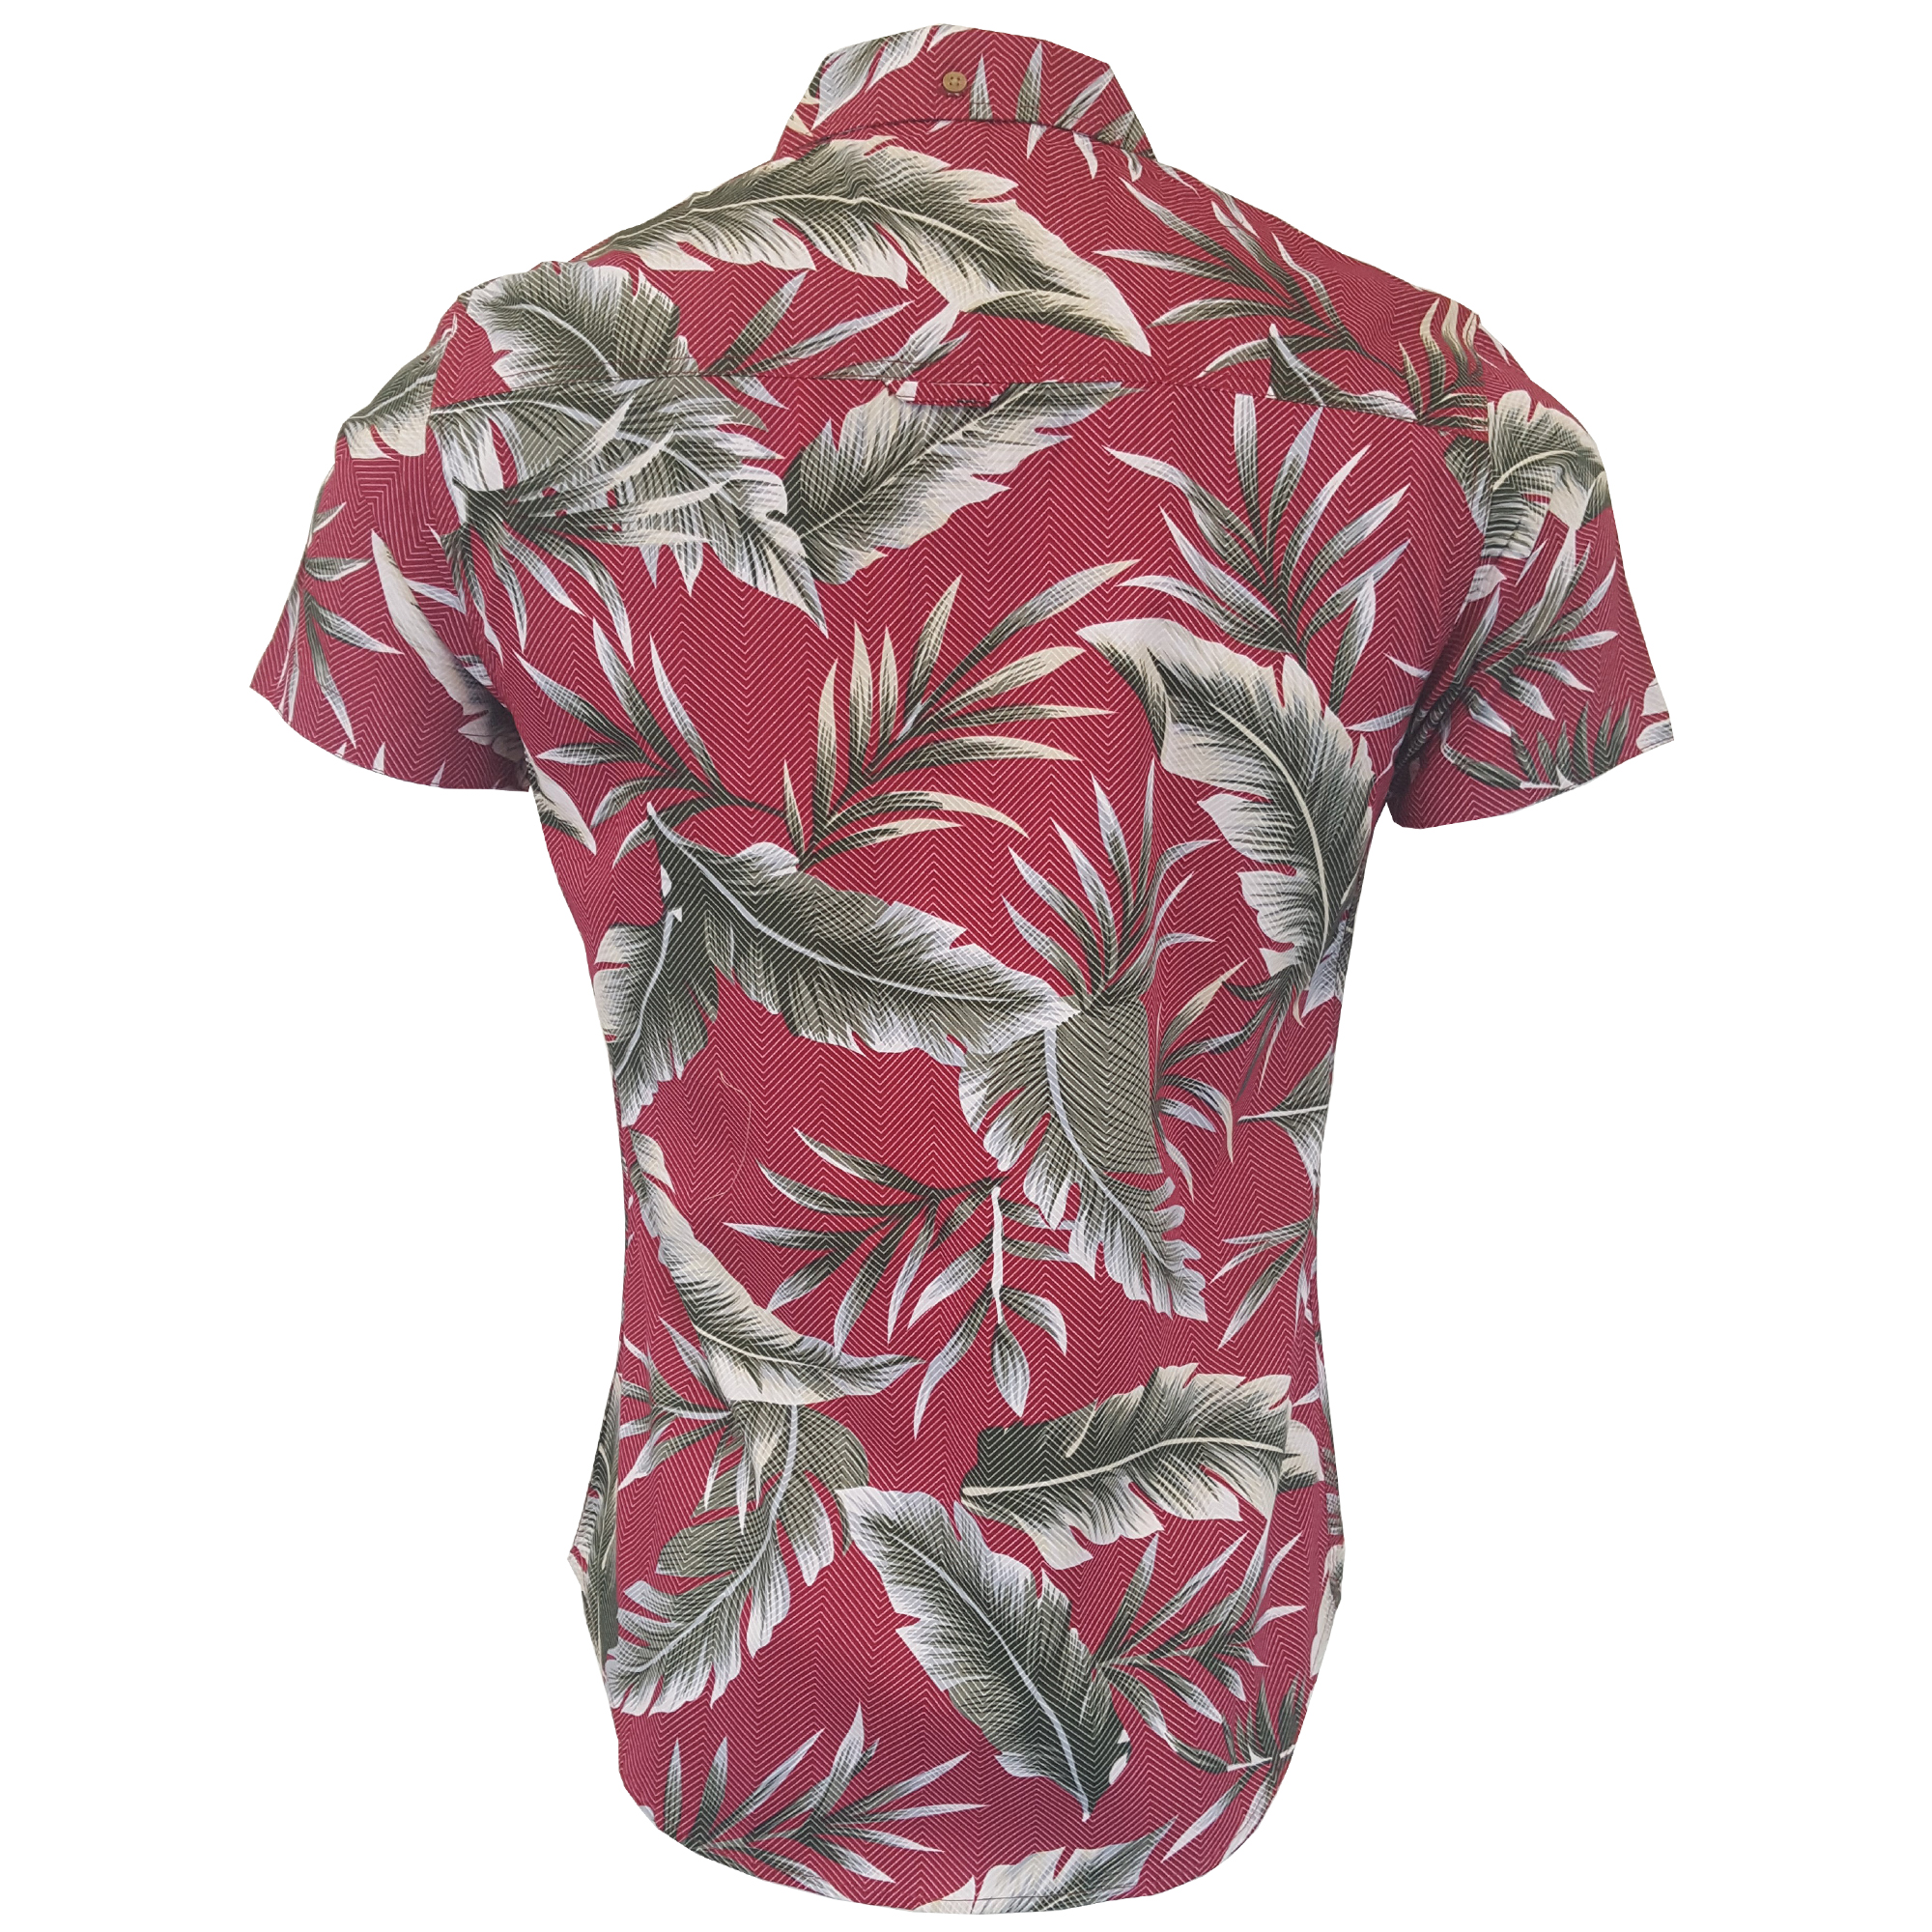 Herren-Hawaii-Hemd-abgezehrte-Blumendruck-Kurzaermeliges-Strand-Urlaub-Sommer-Neu Indexbild 3